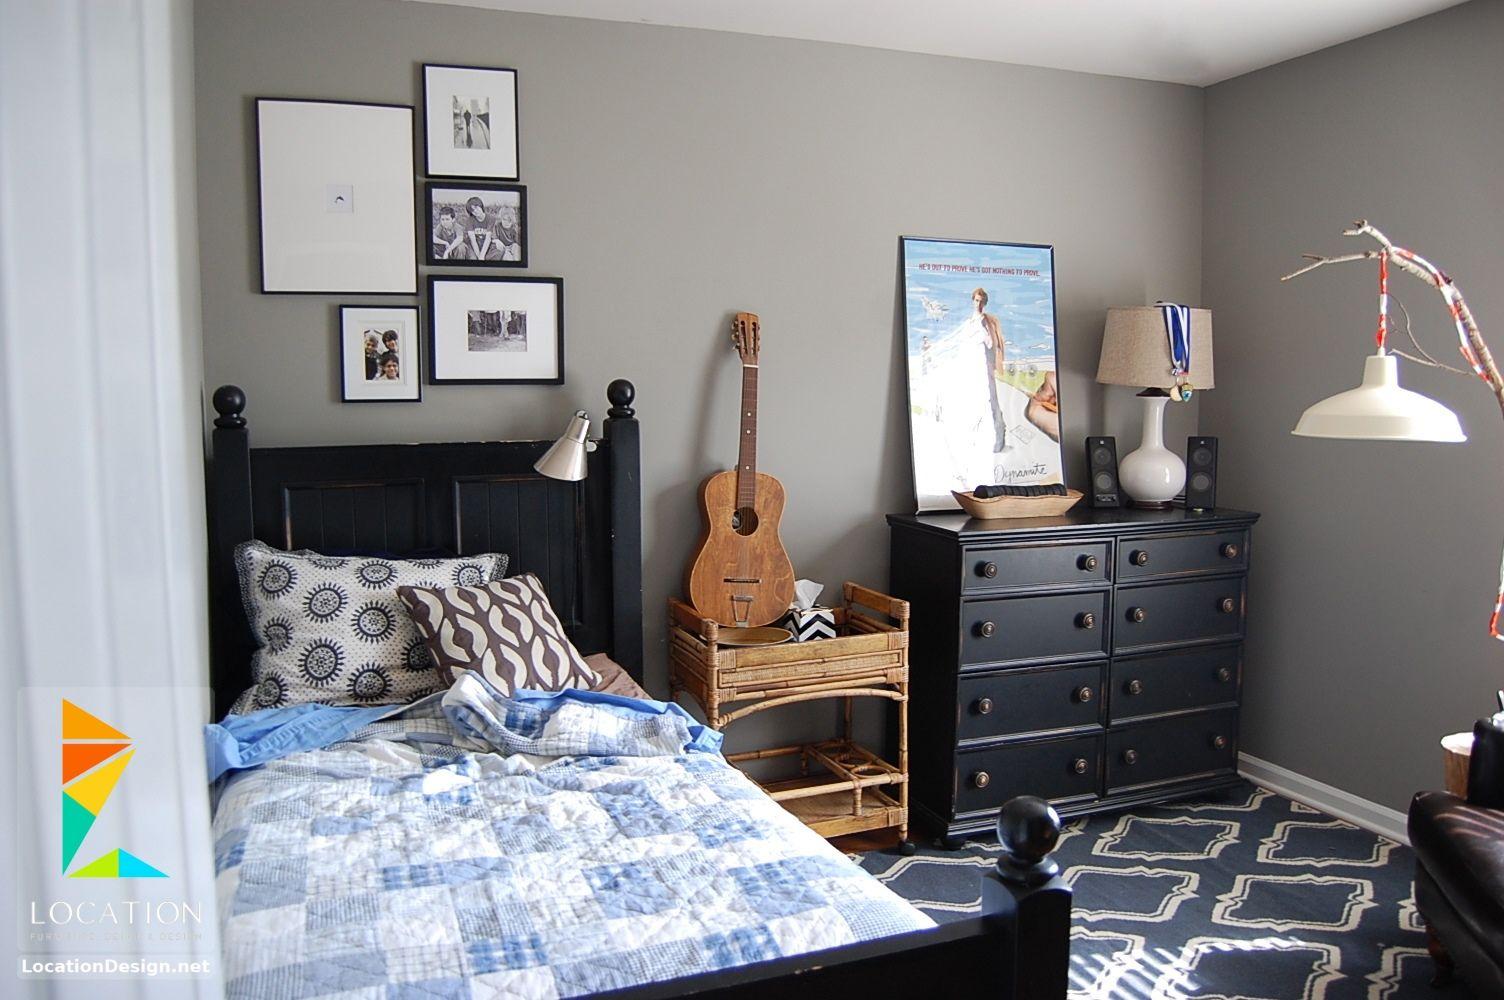 غرف نوم اولاد شباب أحدث موديلات غرف شبابي مودرن لوكشين ديزين نت Boy Room Paint Single Dorm Room Tween Boy Bedroom